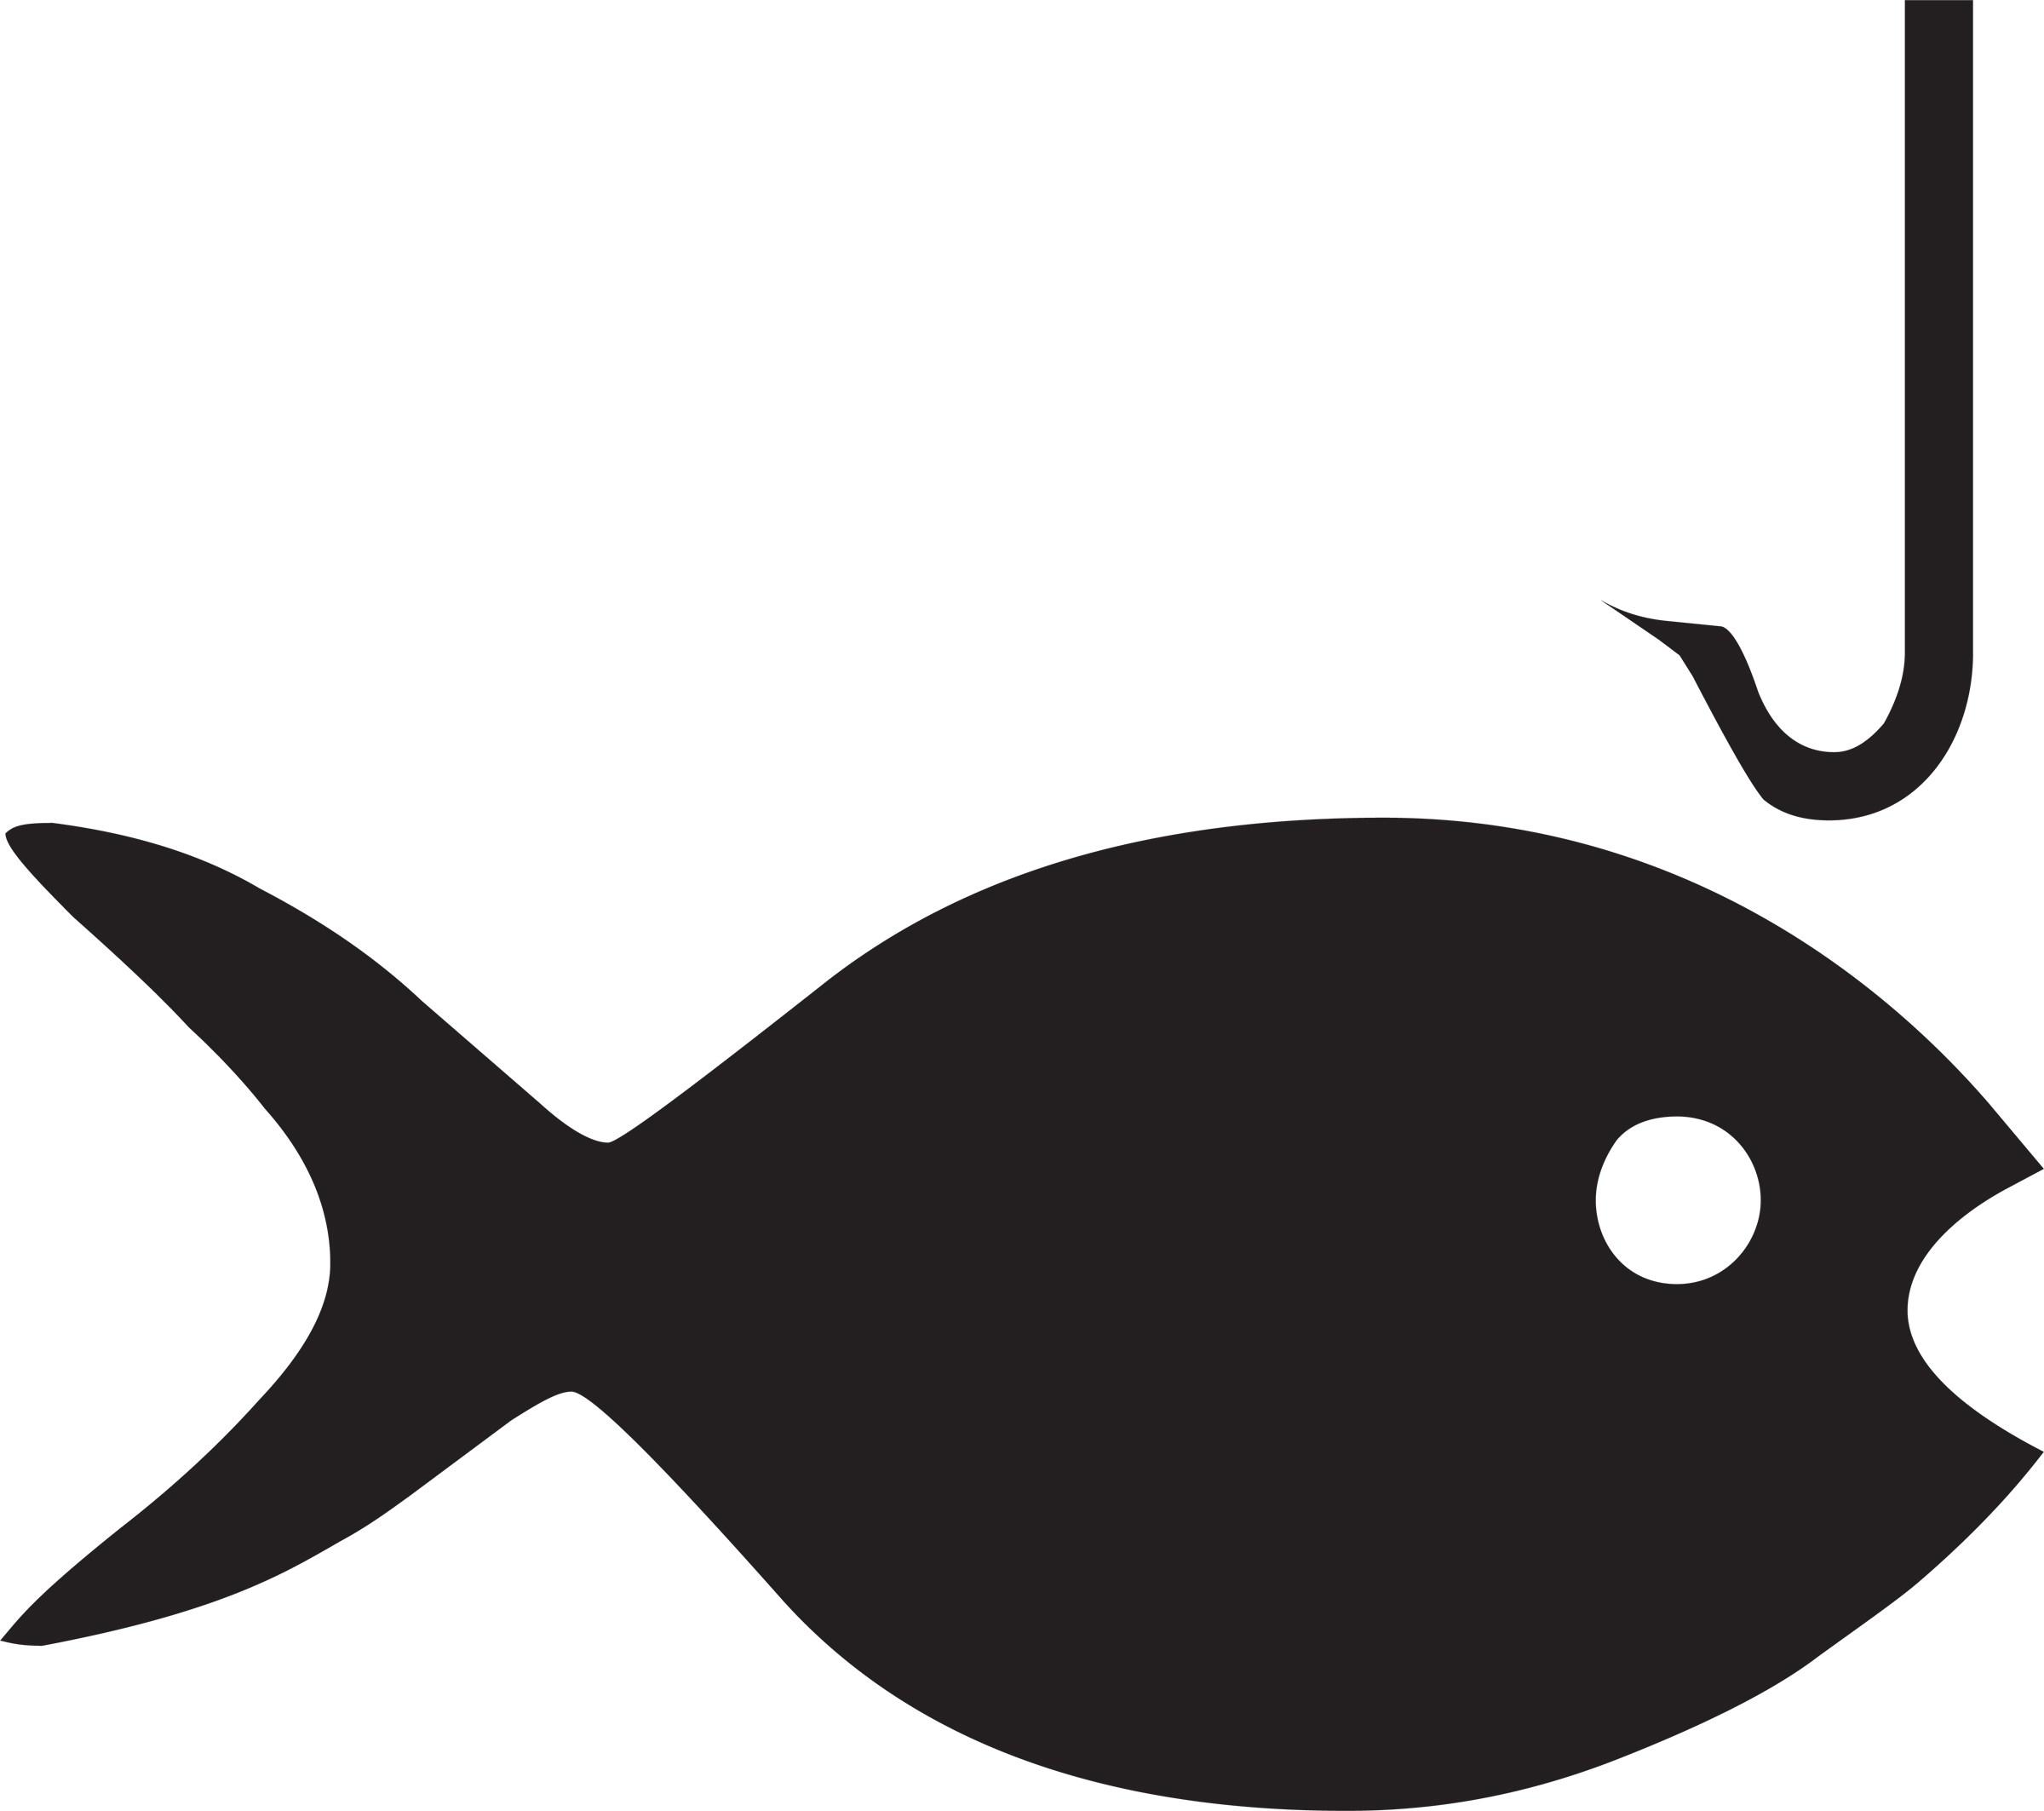 Fish on a hook clipart 8 » Clipart Portal.